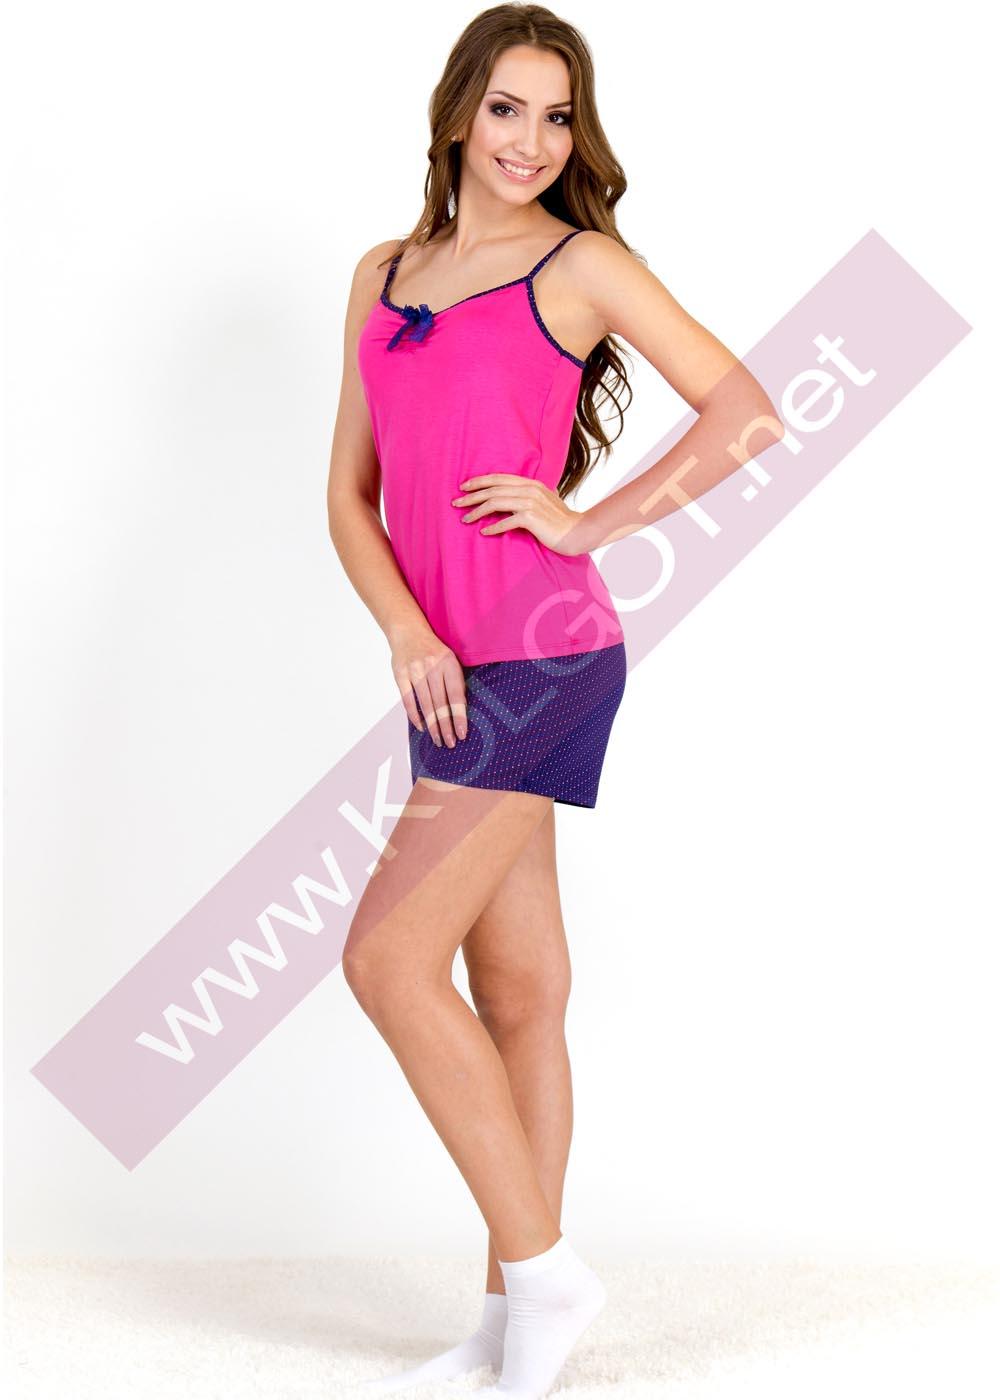 Домашняя одежда Домашний комплект майка + шорты Bright Color 01311<span style='color:#ff0000;'>Распродано</span>